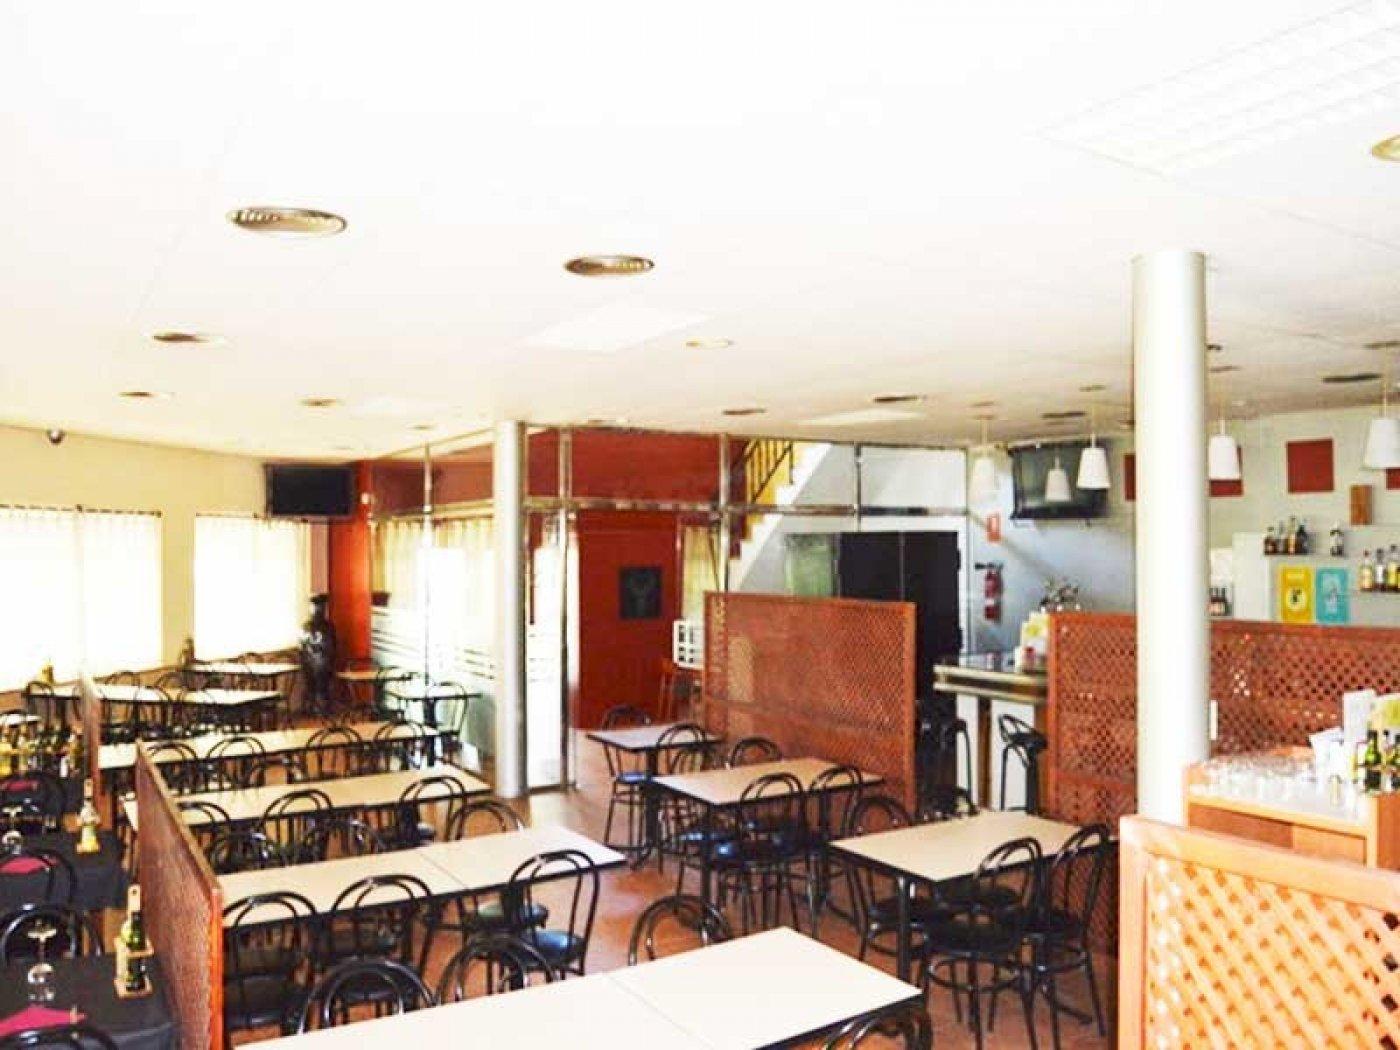 Nave restaurante en polígono cerca de sant sadurní d´anoia - imagenInmueble23